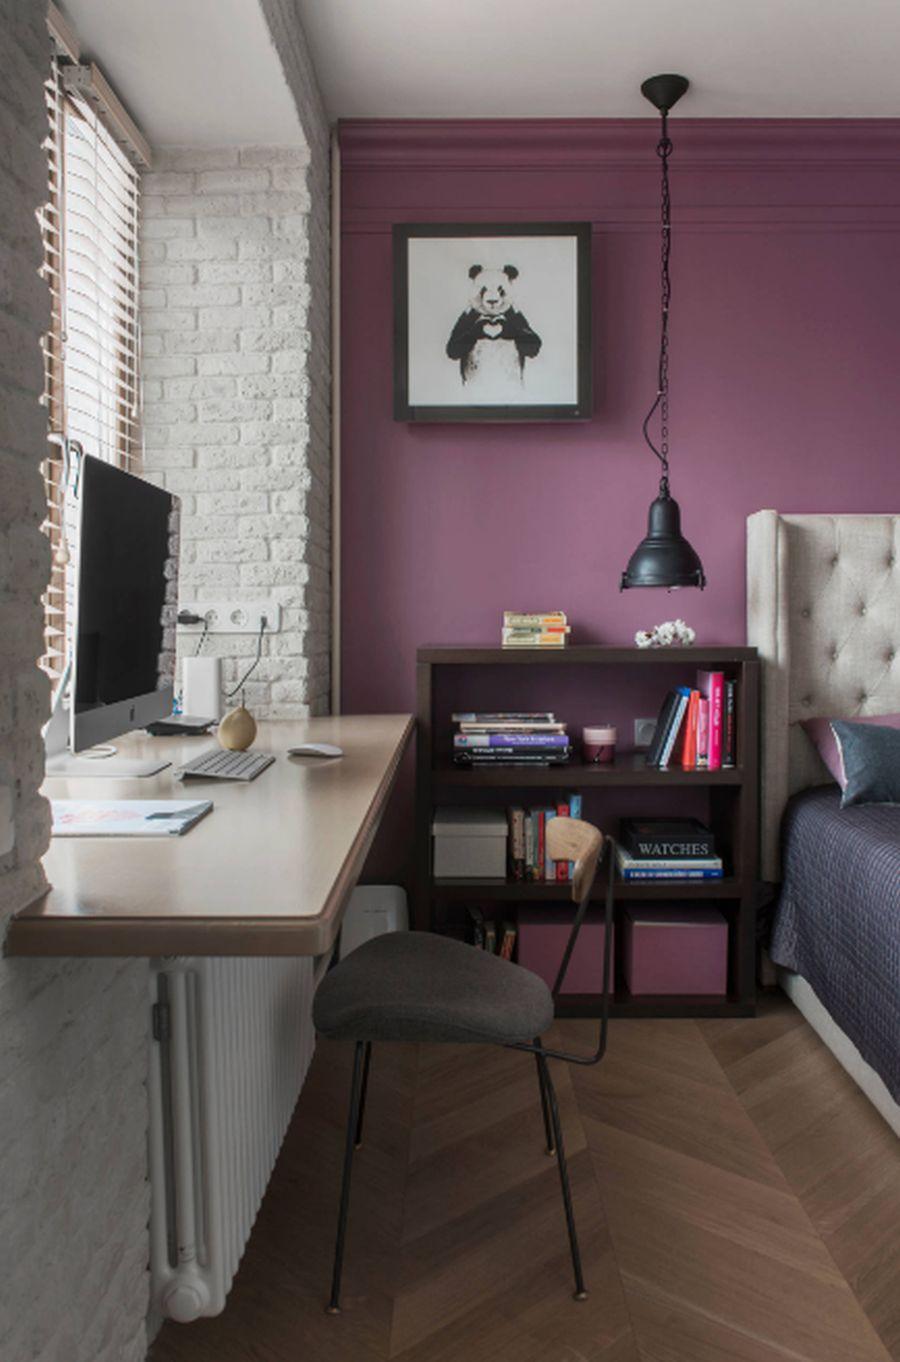 adelaparvu-com-despre-reoganizarea-unui-apartament-de-2-camere-in-3-camere-54-mp-designer-masha-kunyakina-foto-olga-melekesceva-17